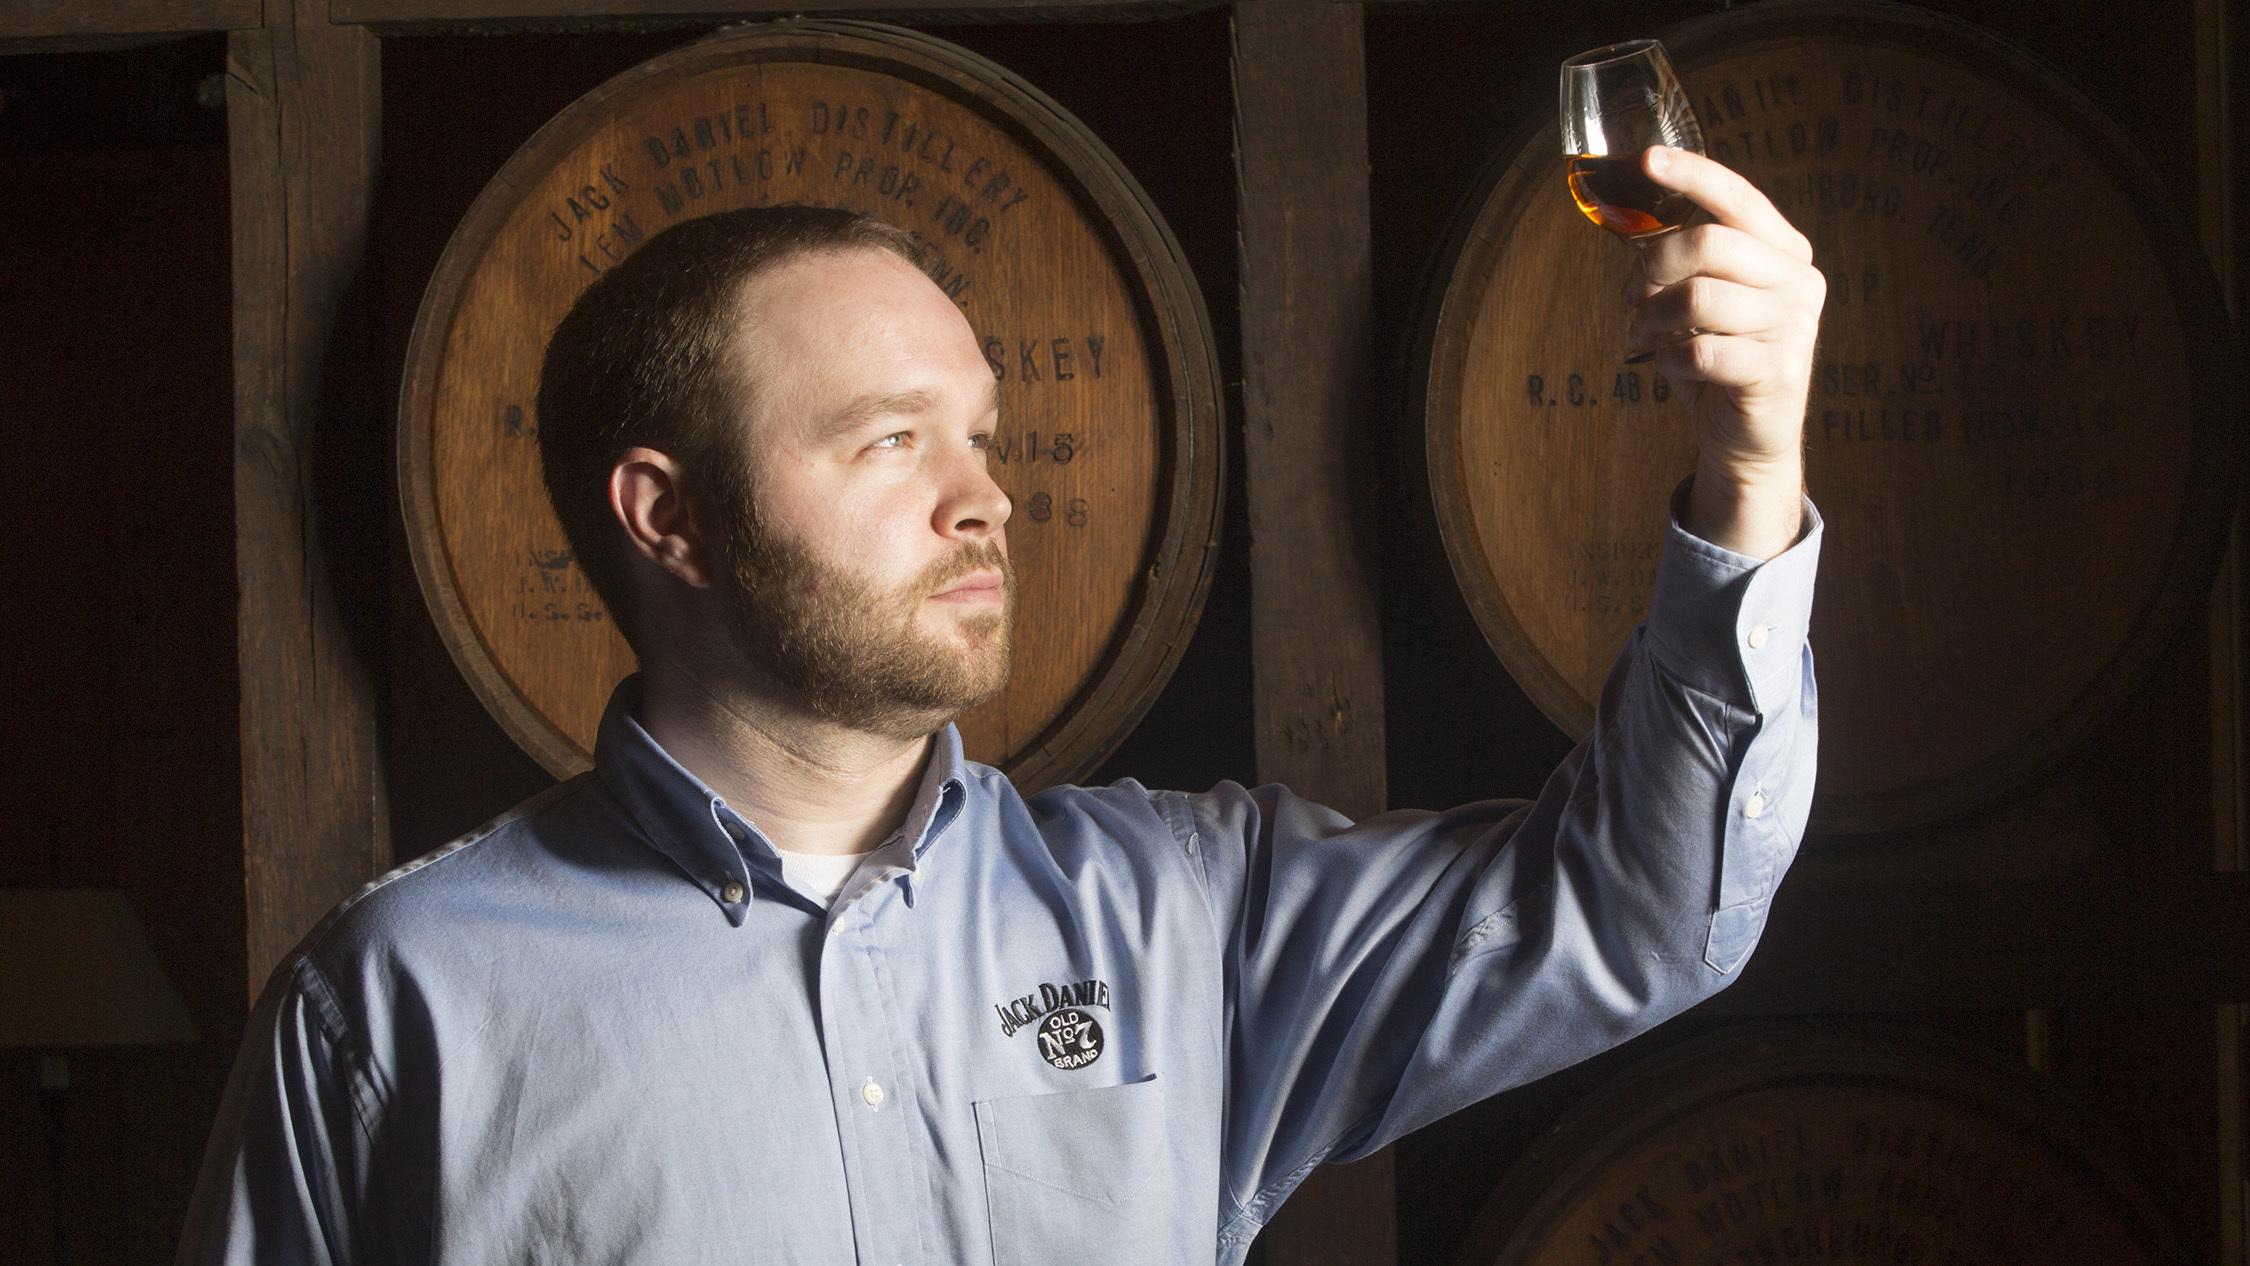 Lynchburg Tennessee Jack Daniel's Chris Fletcher taste test